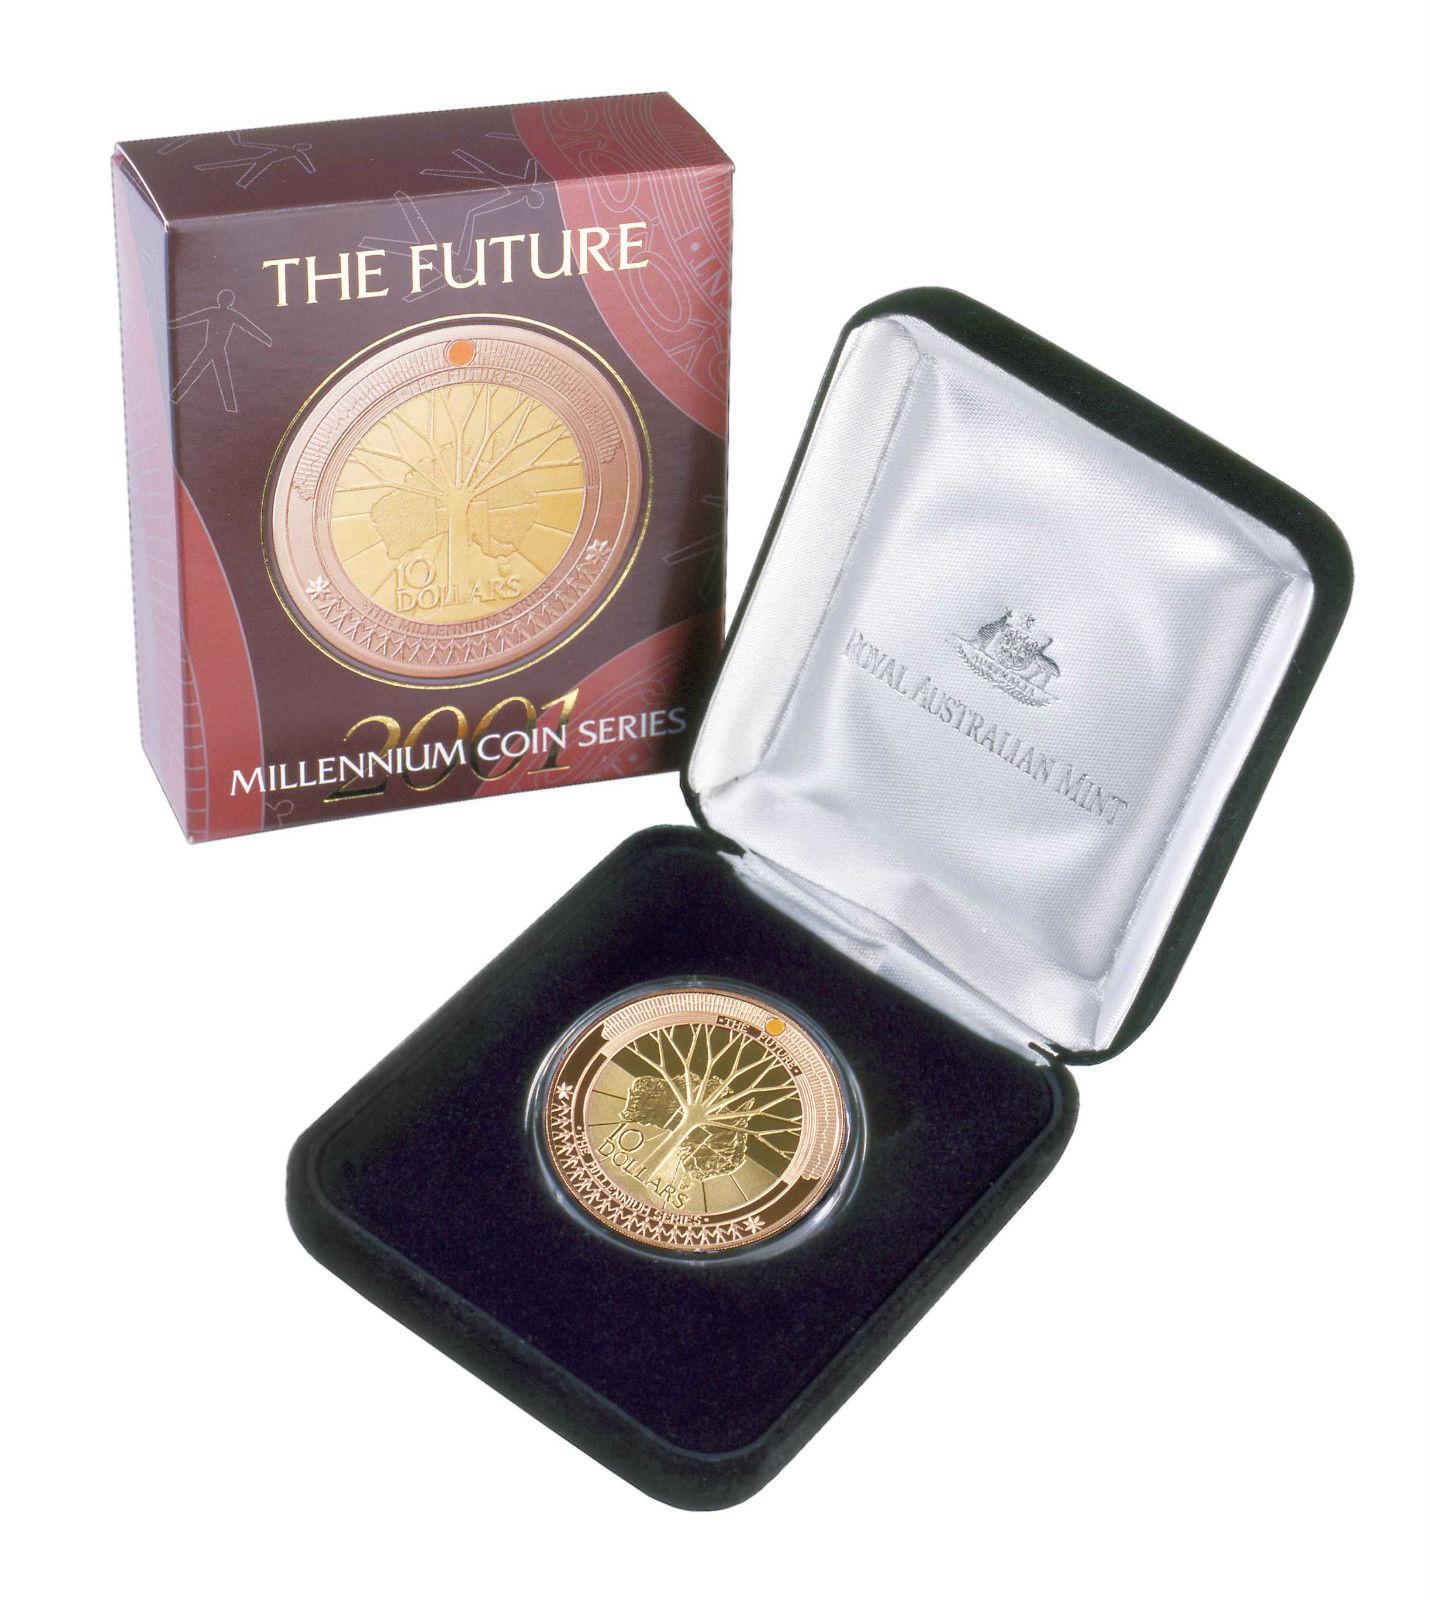 Thumbnail for 2001 The Future - Millennium Coin Series